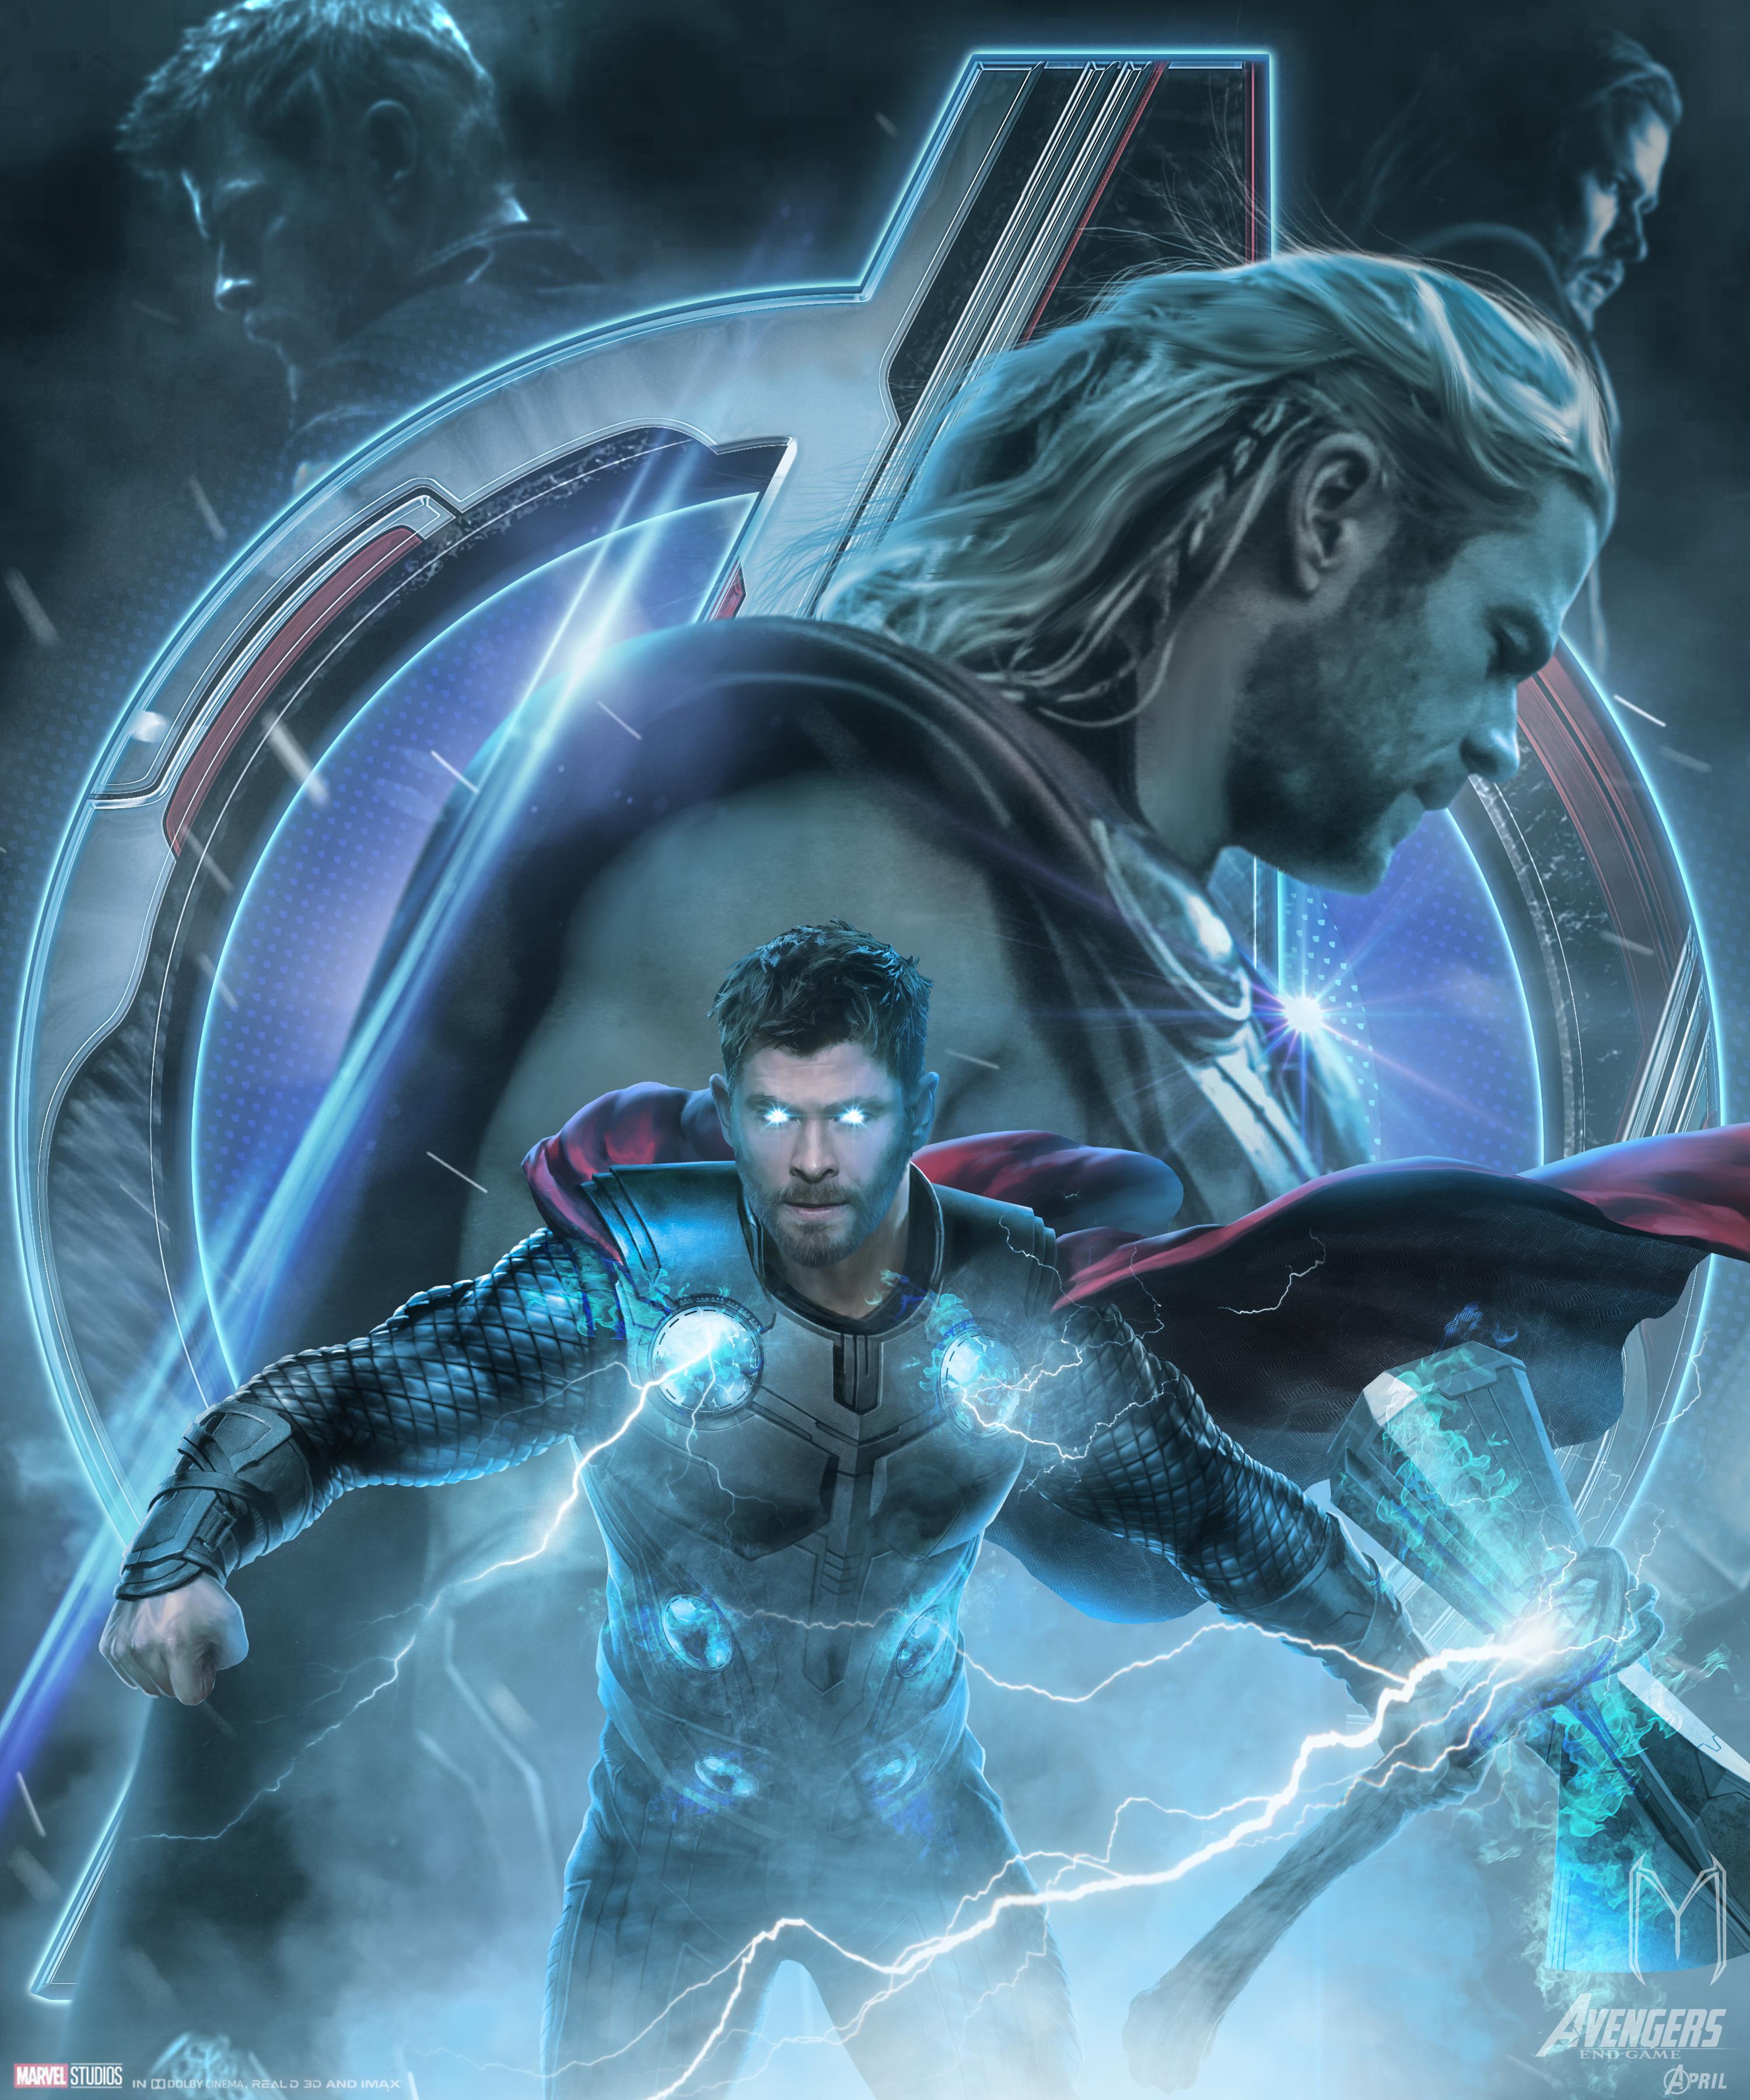 Avengers Endgame Thor Poster Artwork Wallpaper, HD Movies